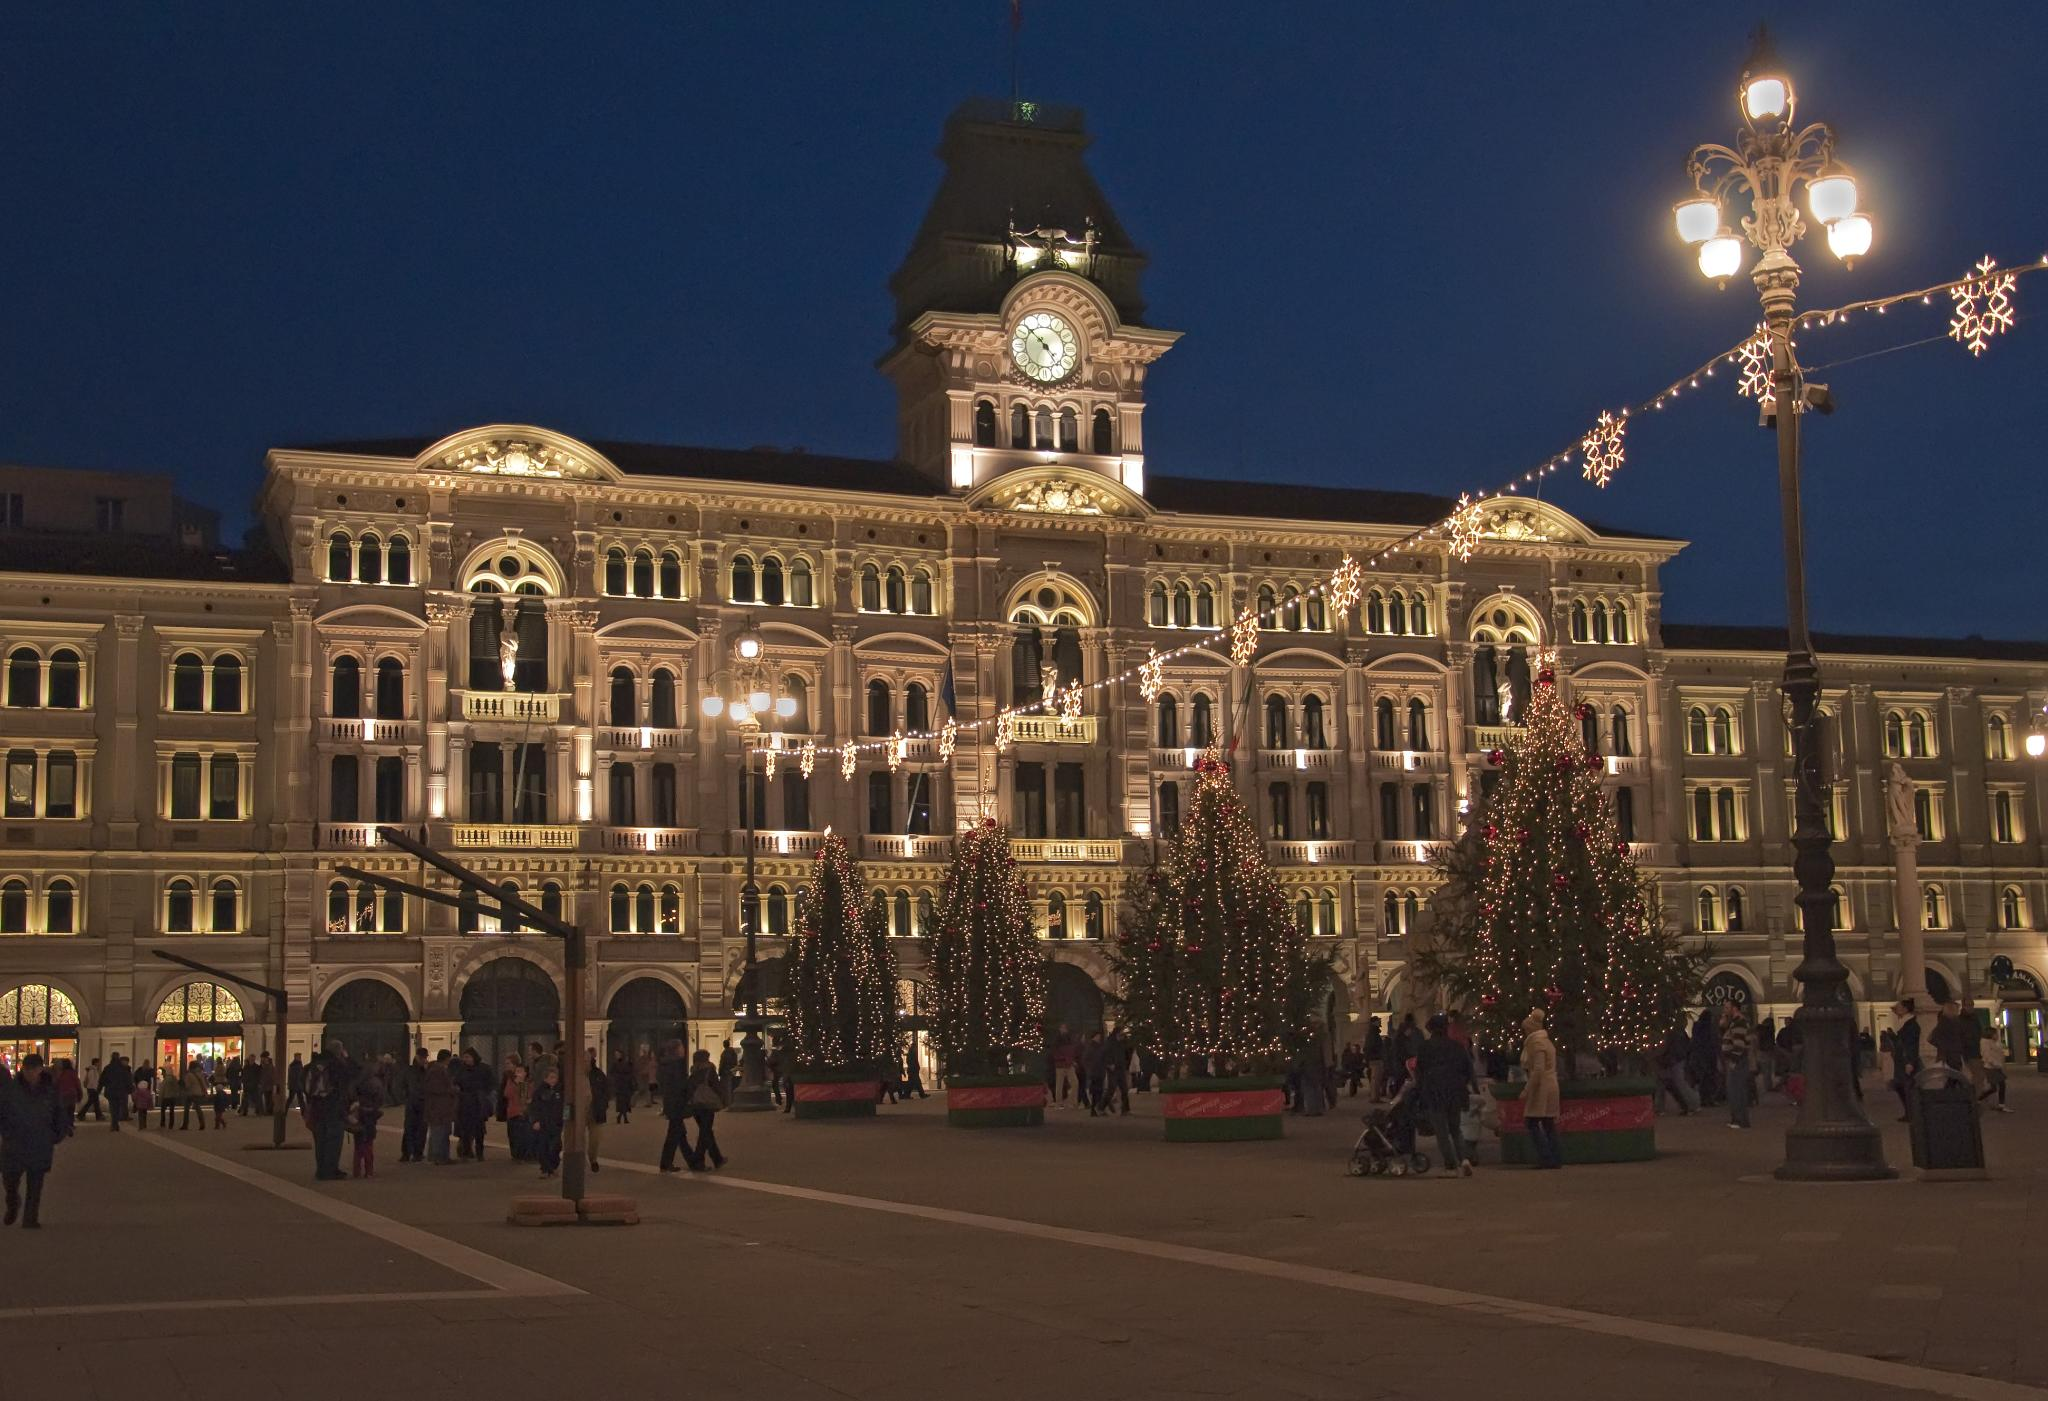 Mercatini di Natale Friuli Venezia Giulia 2019